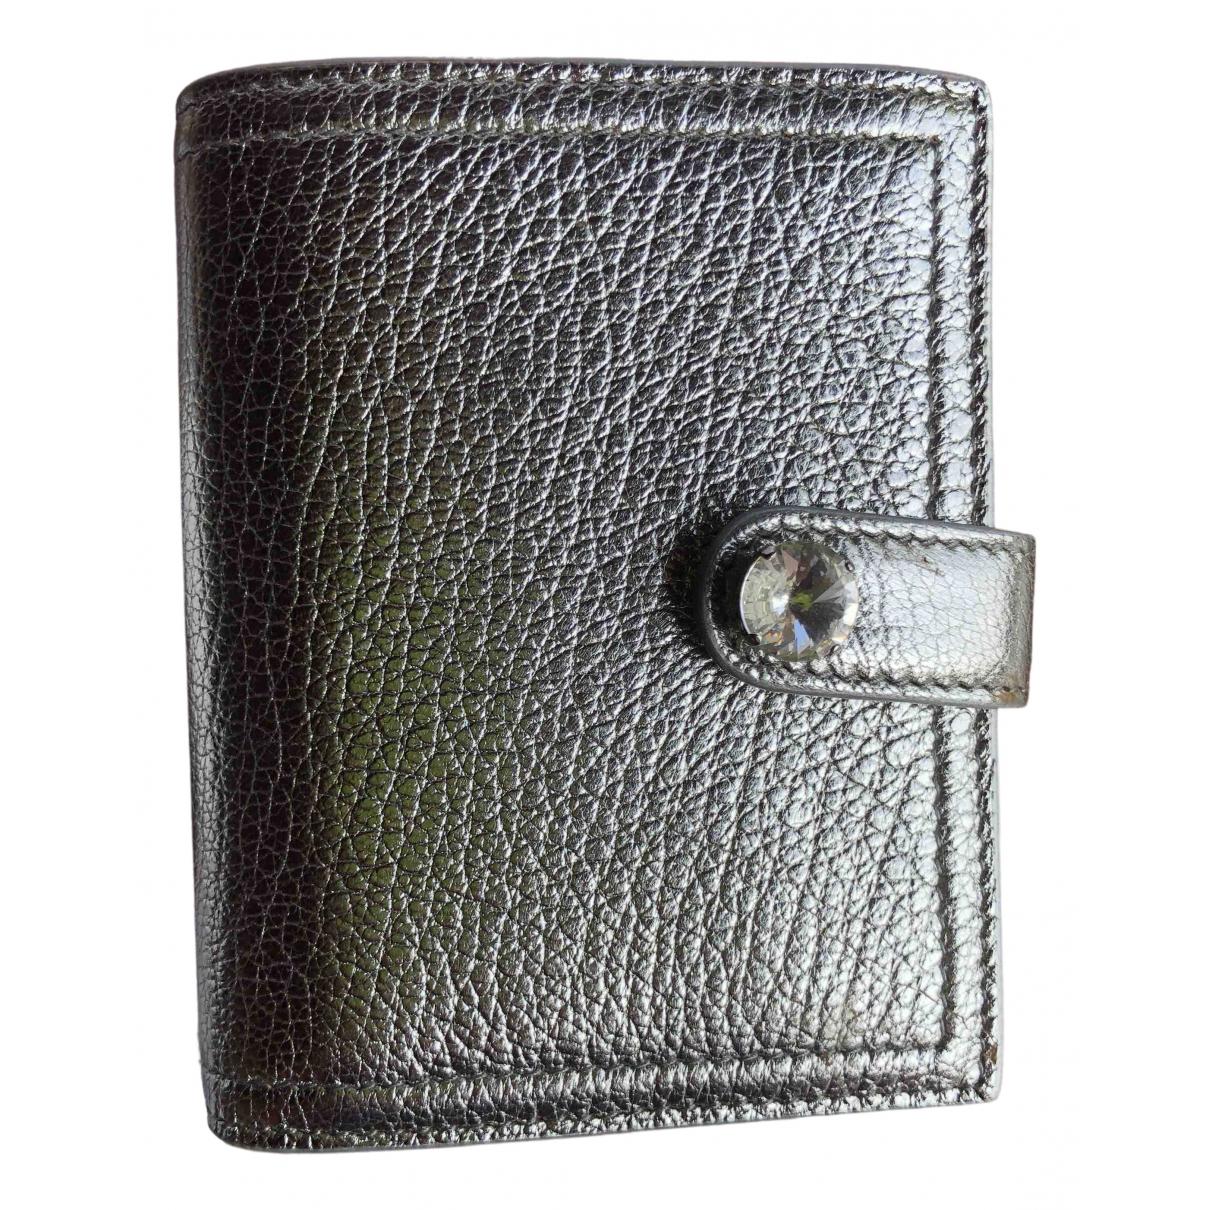 Miu Miu N Silver Leather wallet for Women N